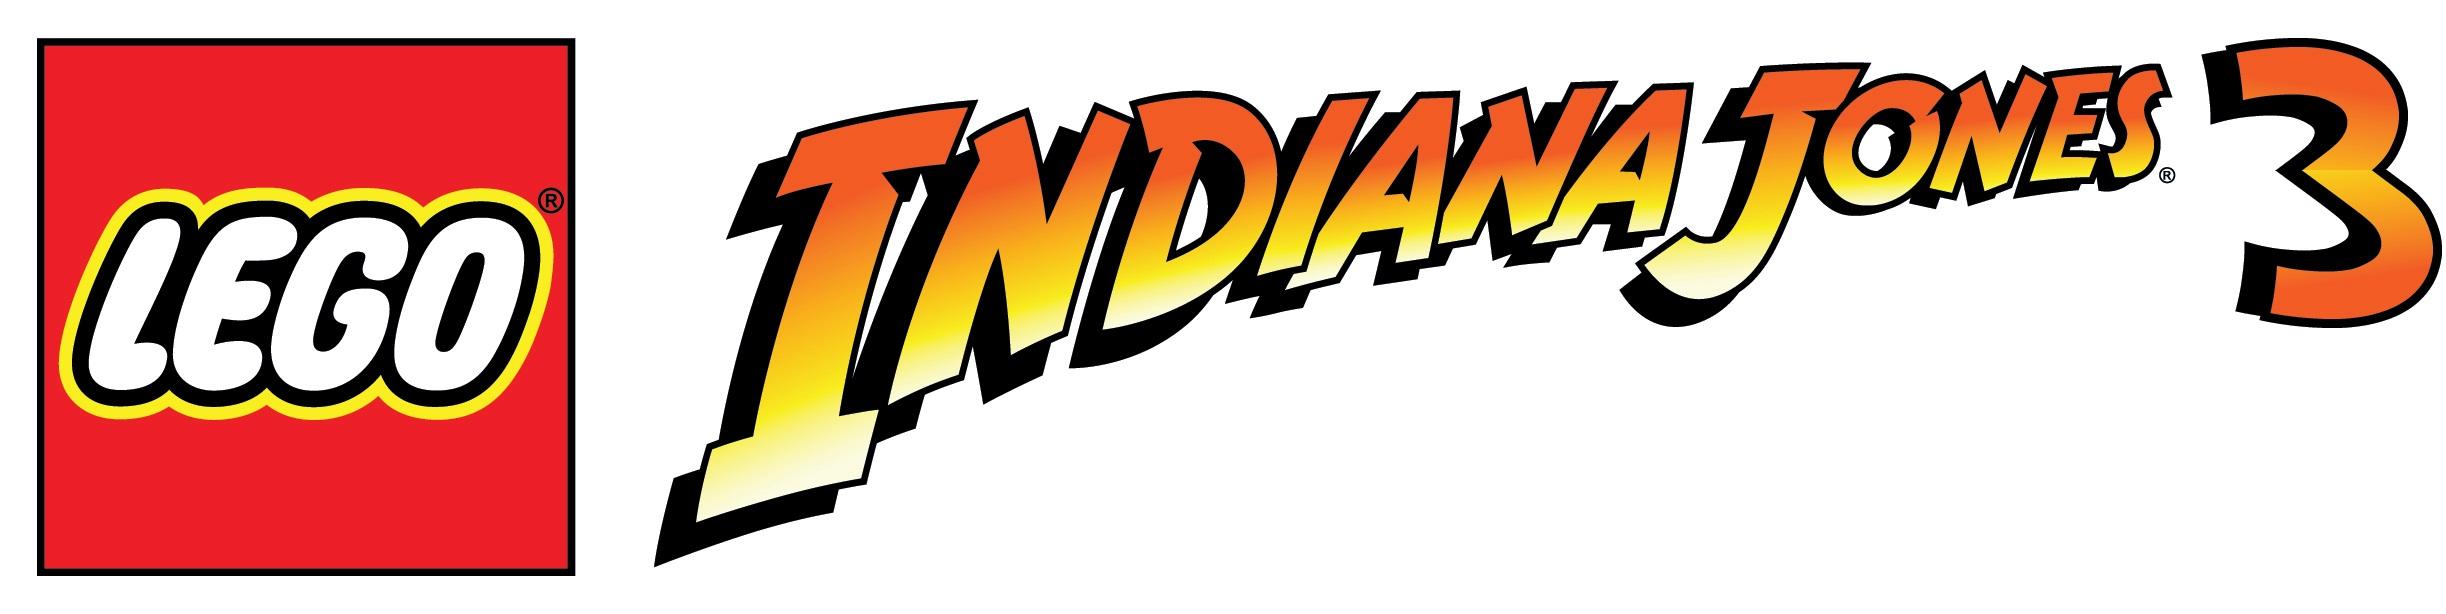 indiana jones the lost temple